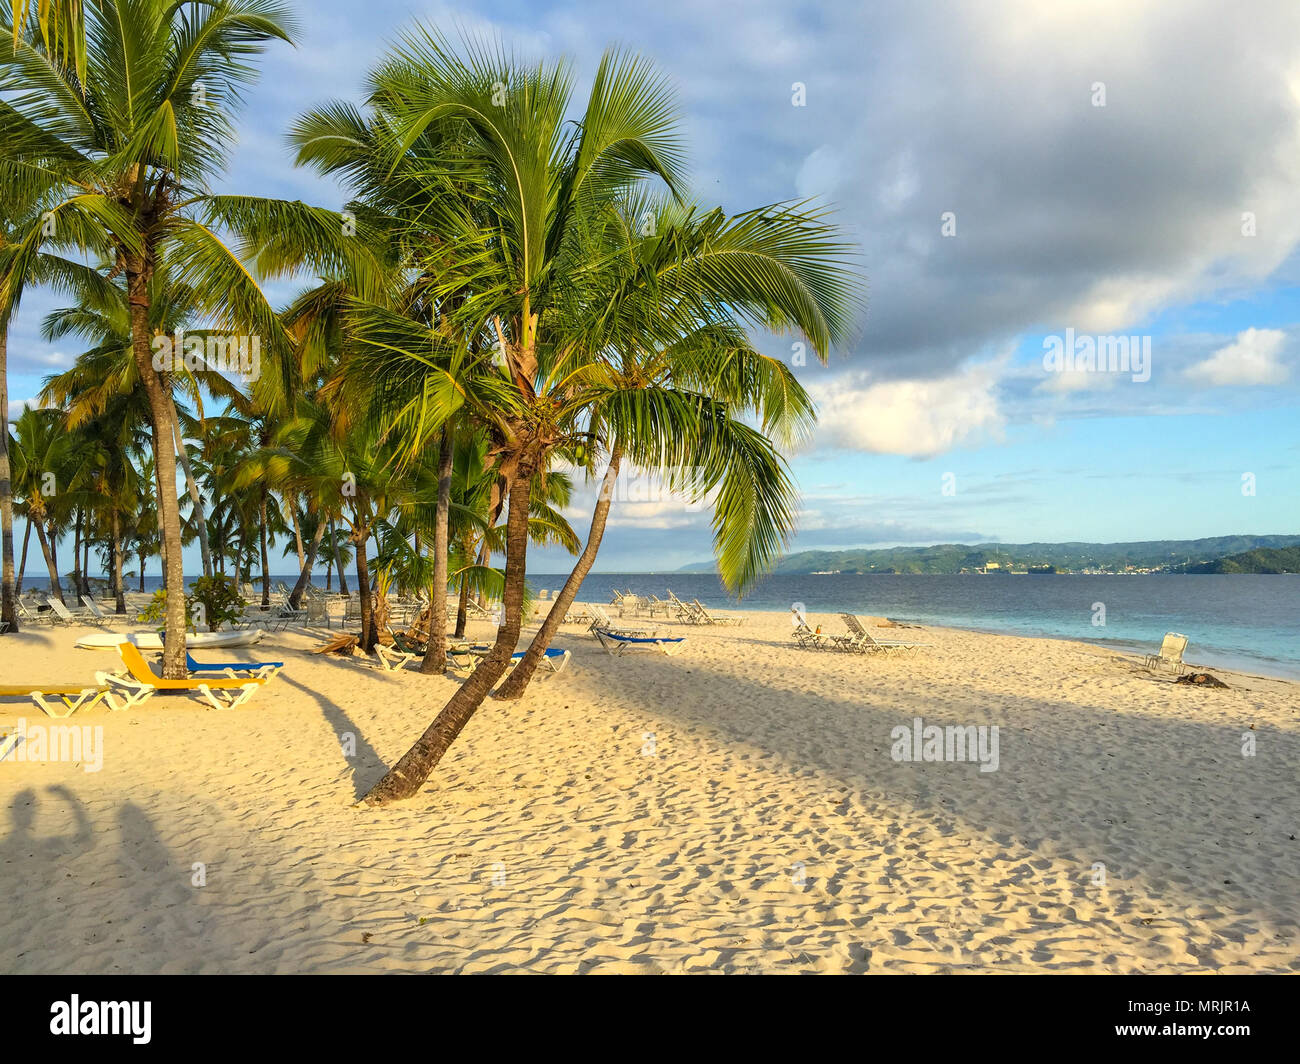 Beach Caribbean Sea, beautiful sandy beach, palms and sunbeds, shadow of the sun - Stock Image